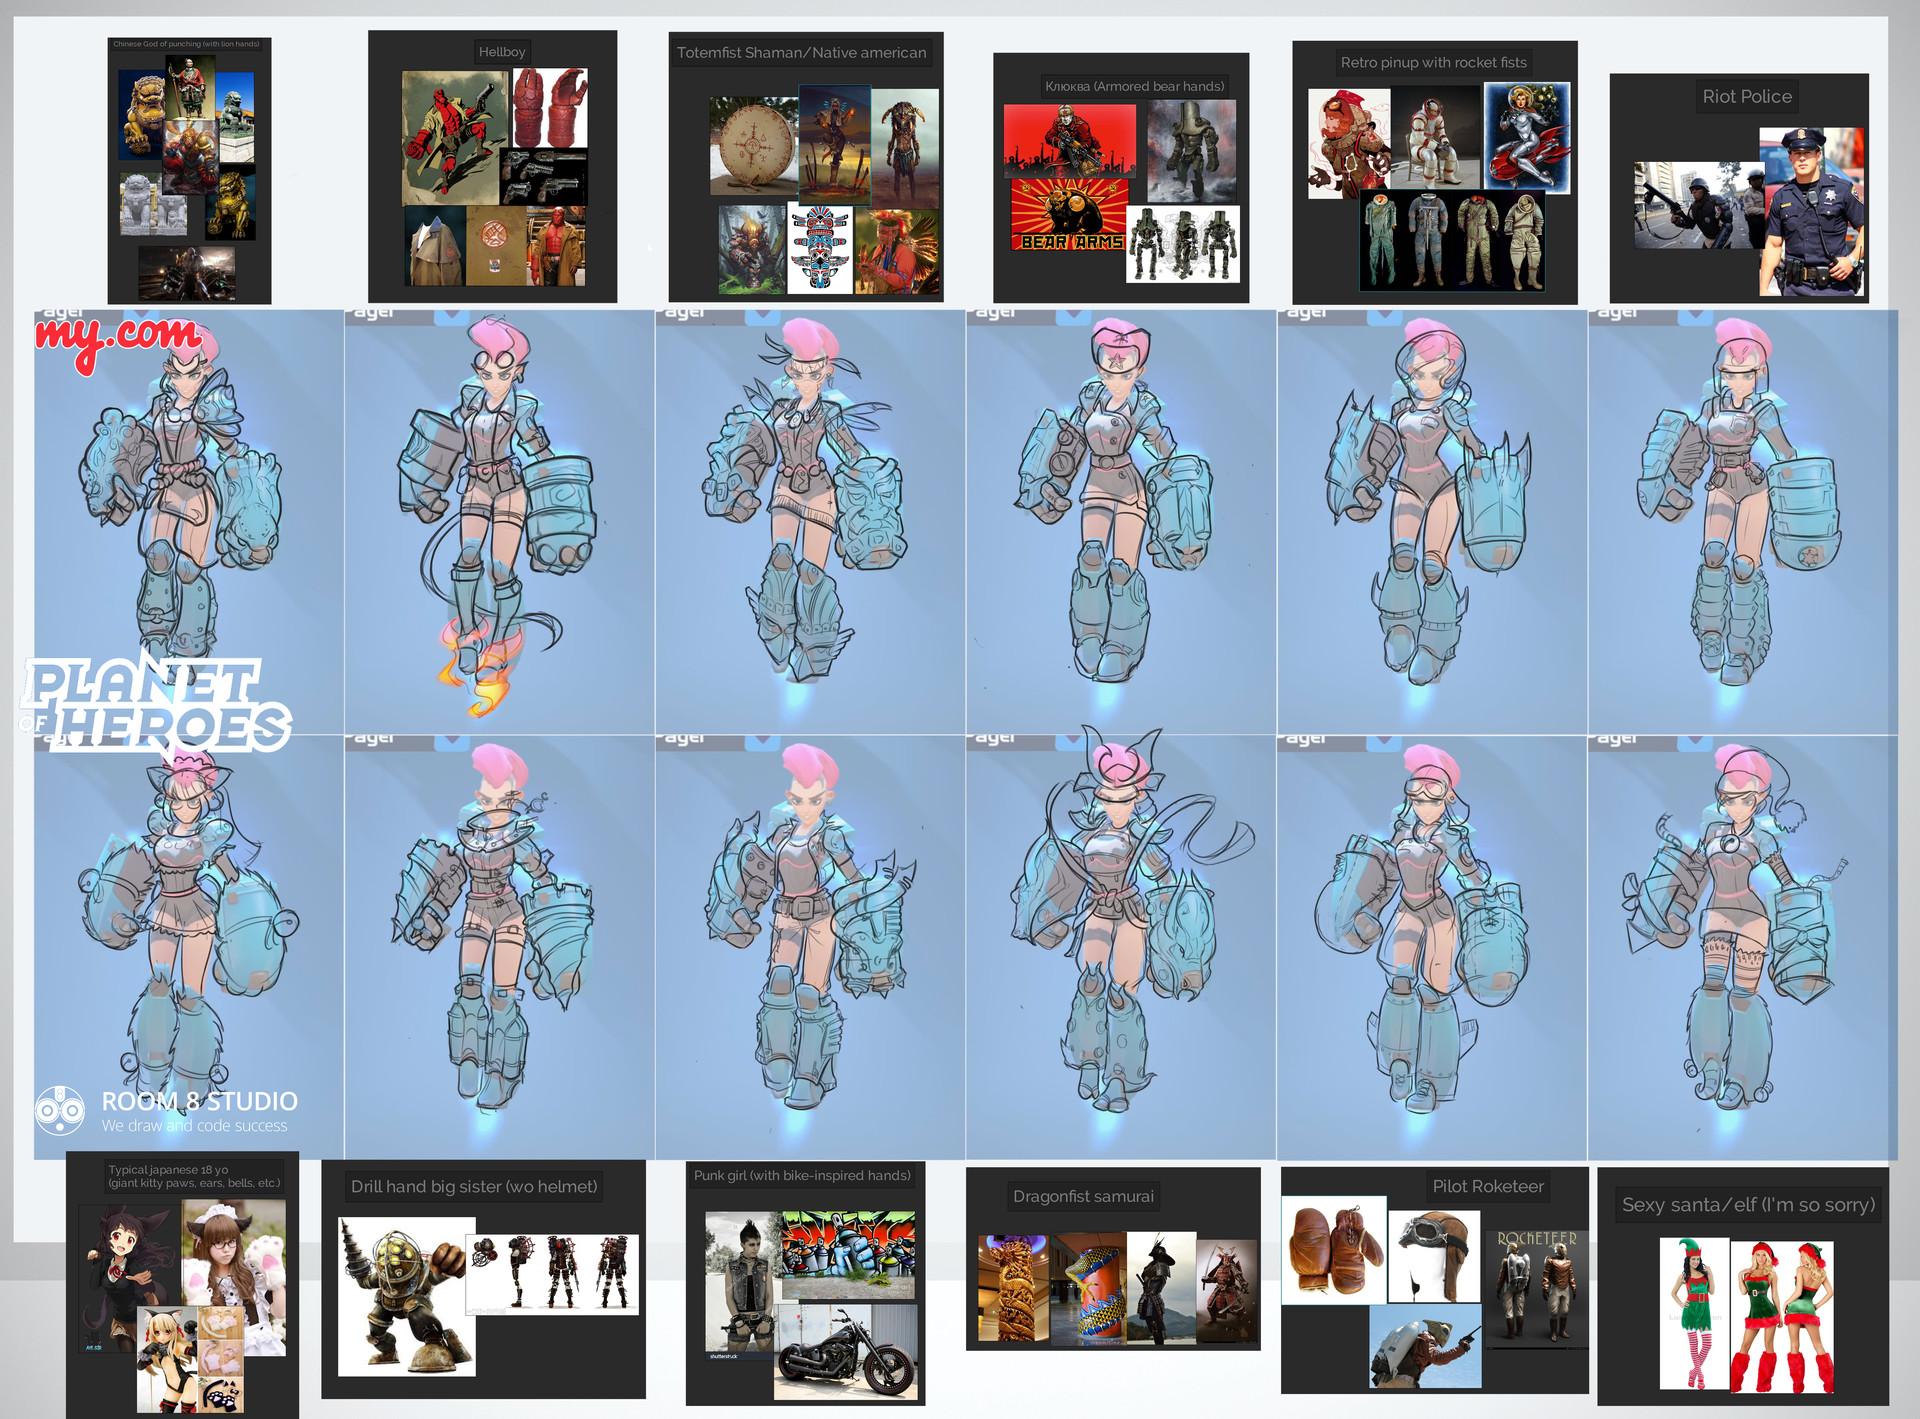 Room 8 studio demolisher skin sketches oct 10th min copy